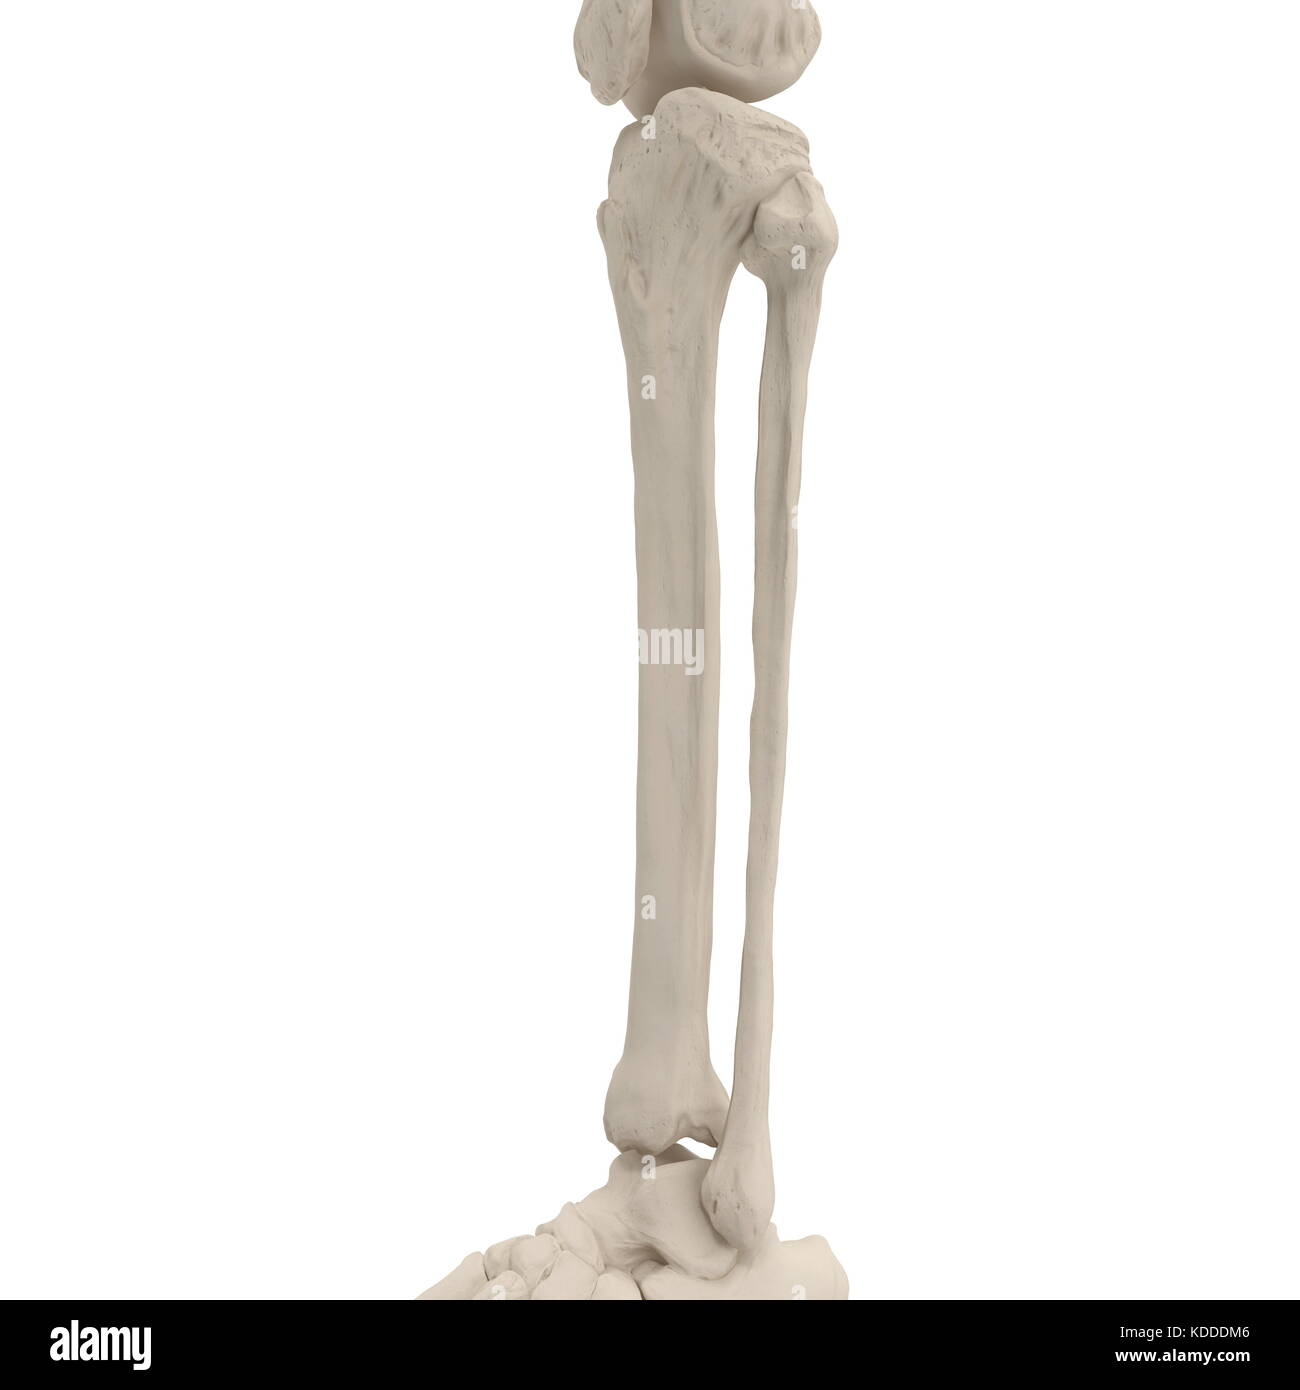 Bones Of Leg Stockfotos & Bones Of Leg Bilder - Seite 7 - Alamy